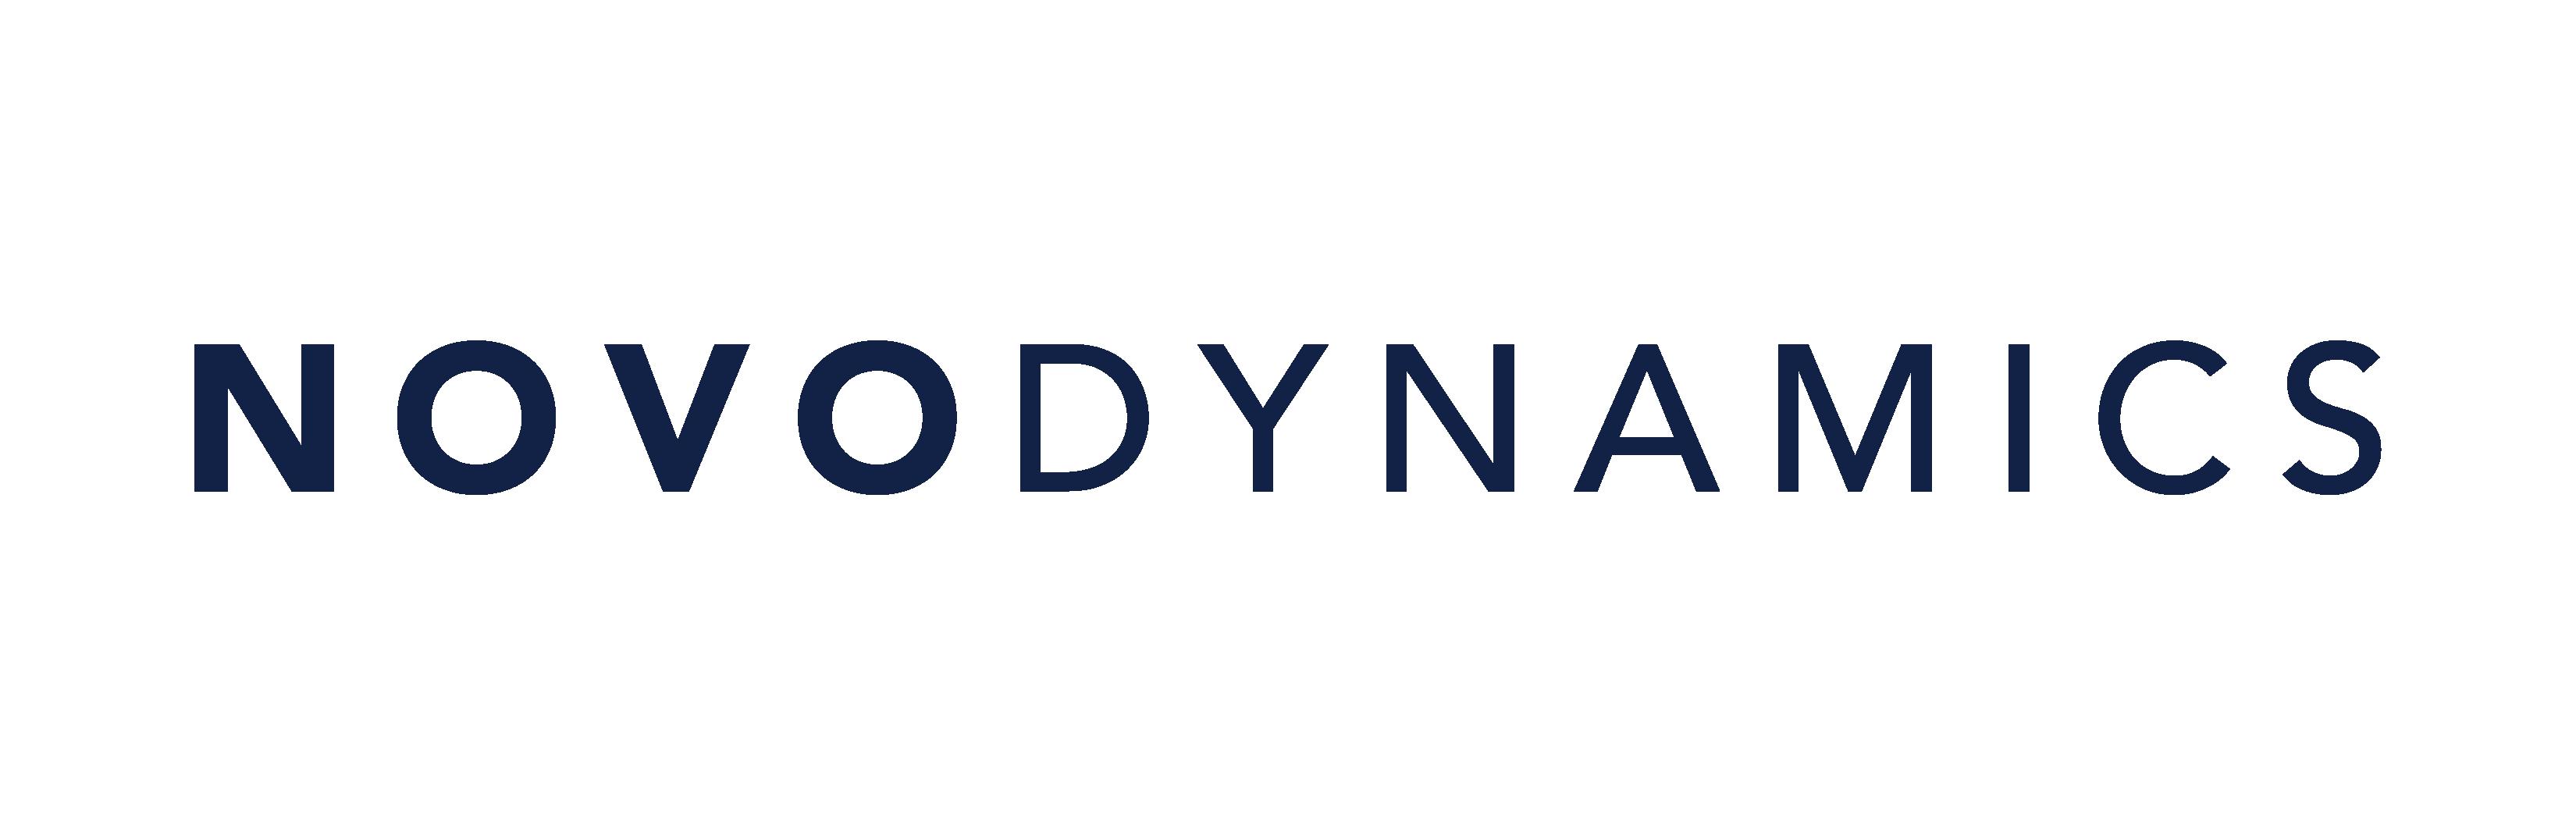 NovoDynamics branding